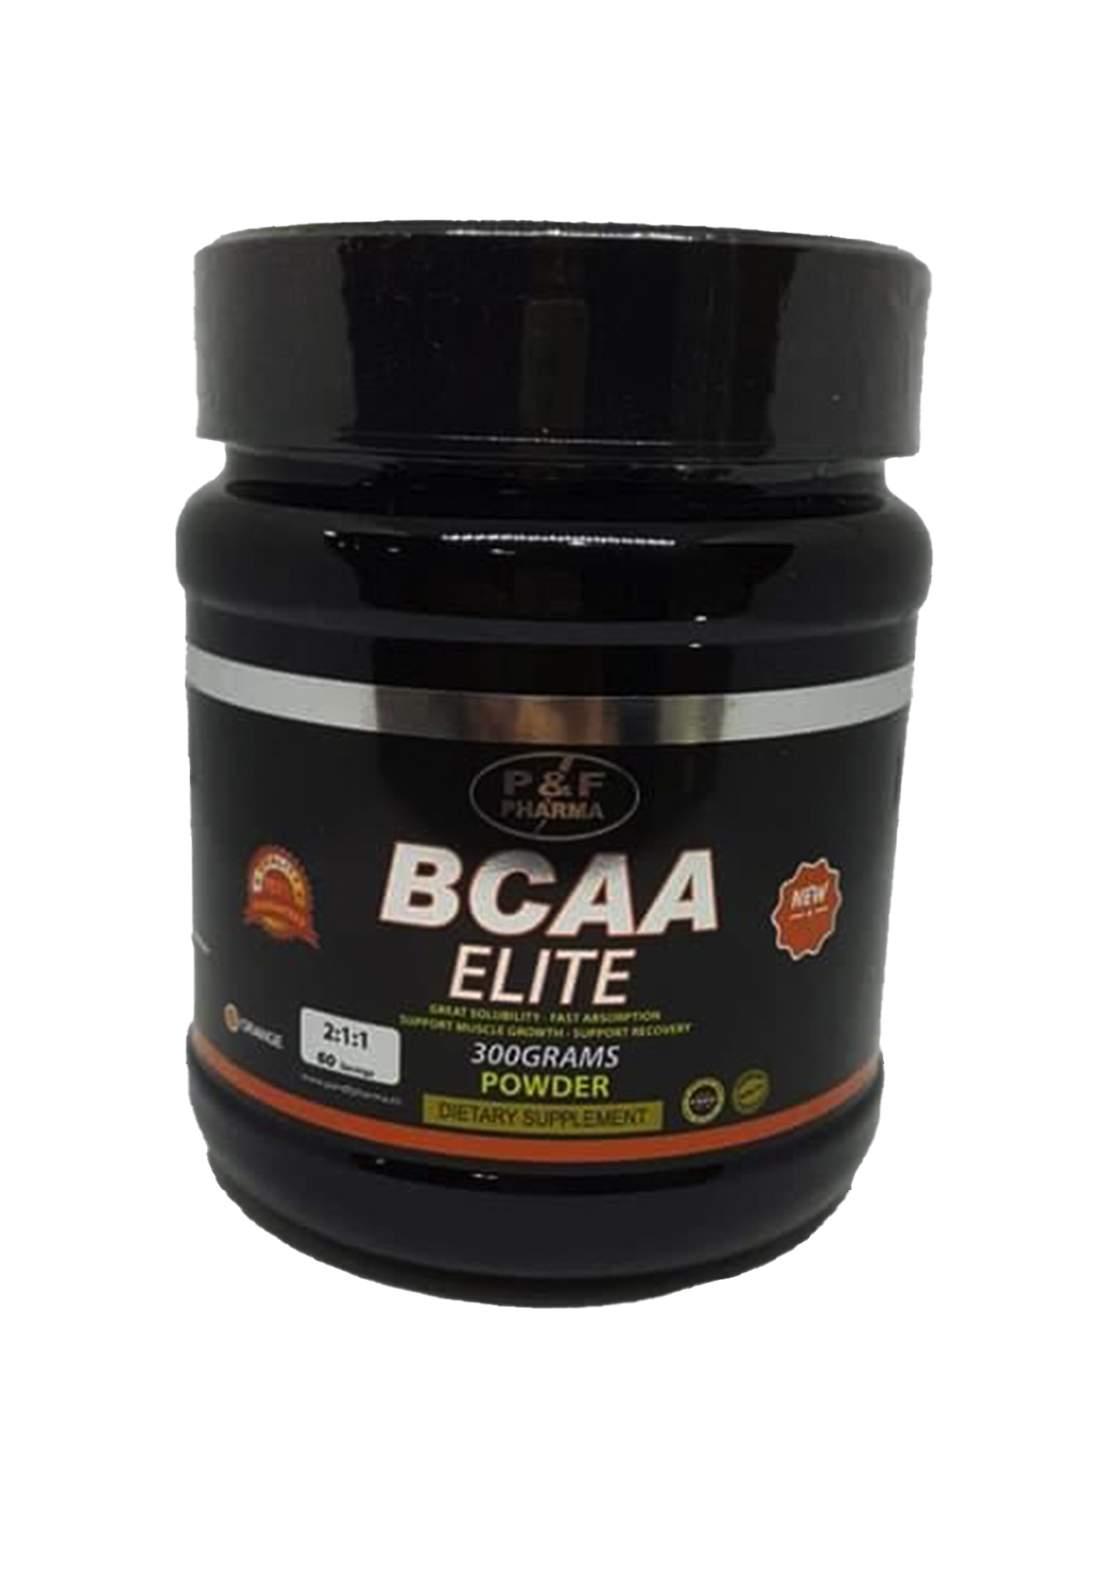 P&F Pharma Bcaa powder-300gm مكمل غذائي